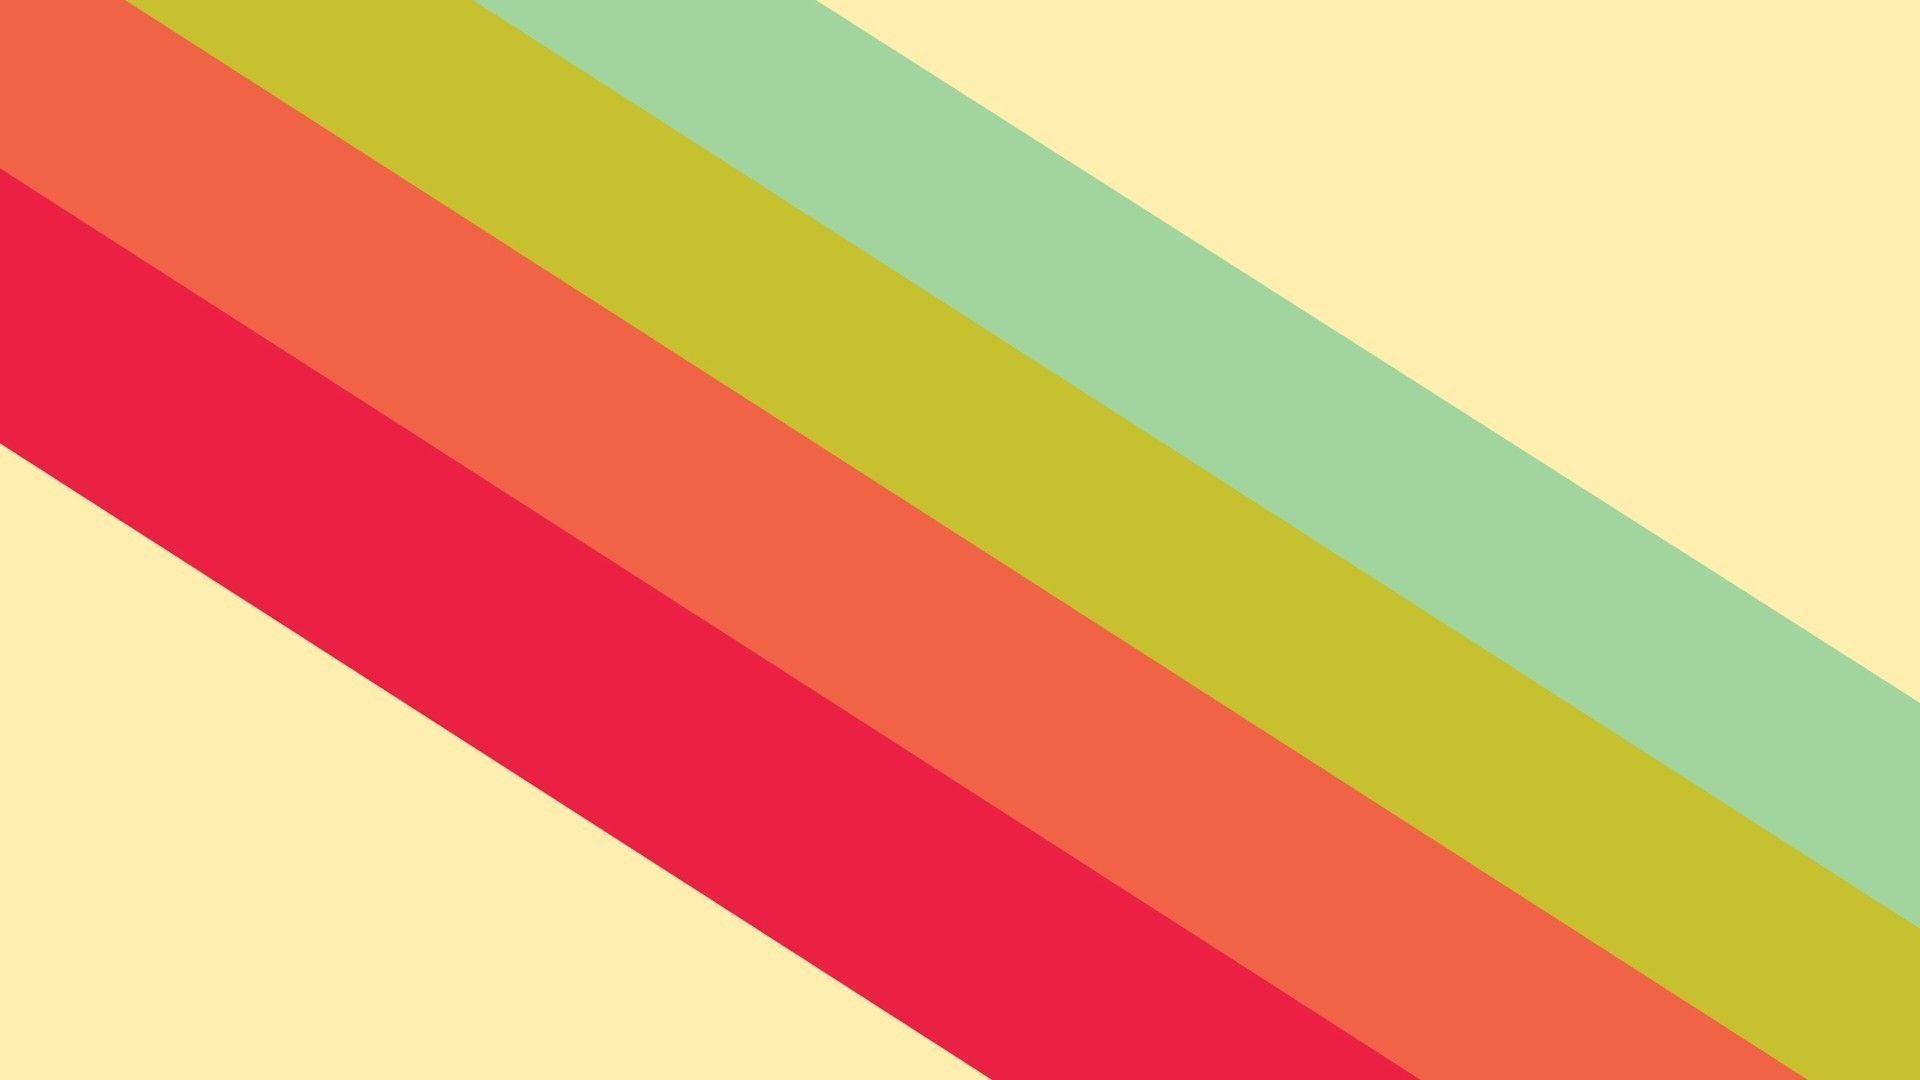 Wallpapers Stripes HD - Wallpaper Cave